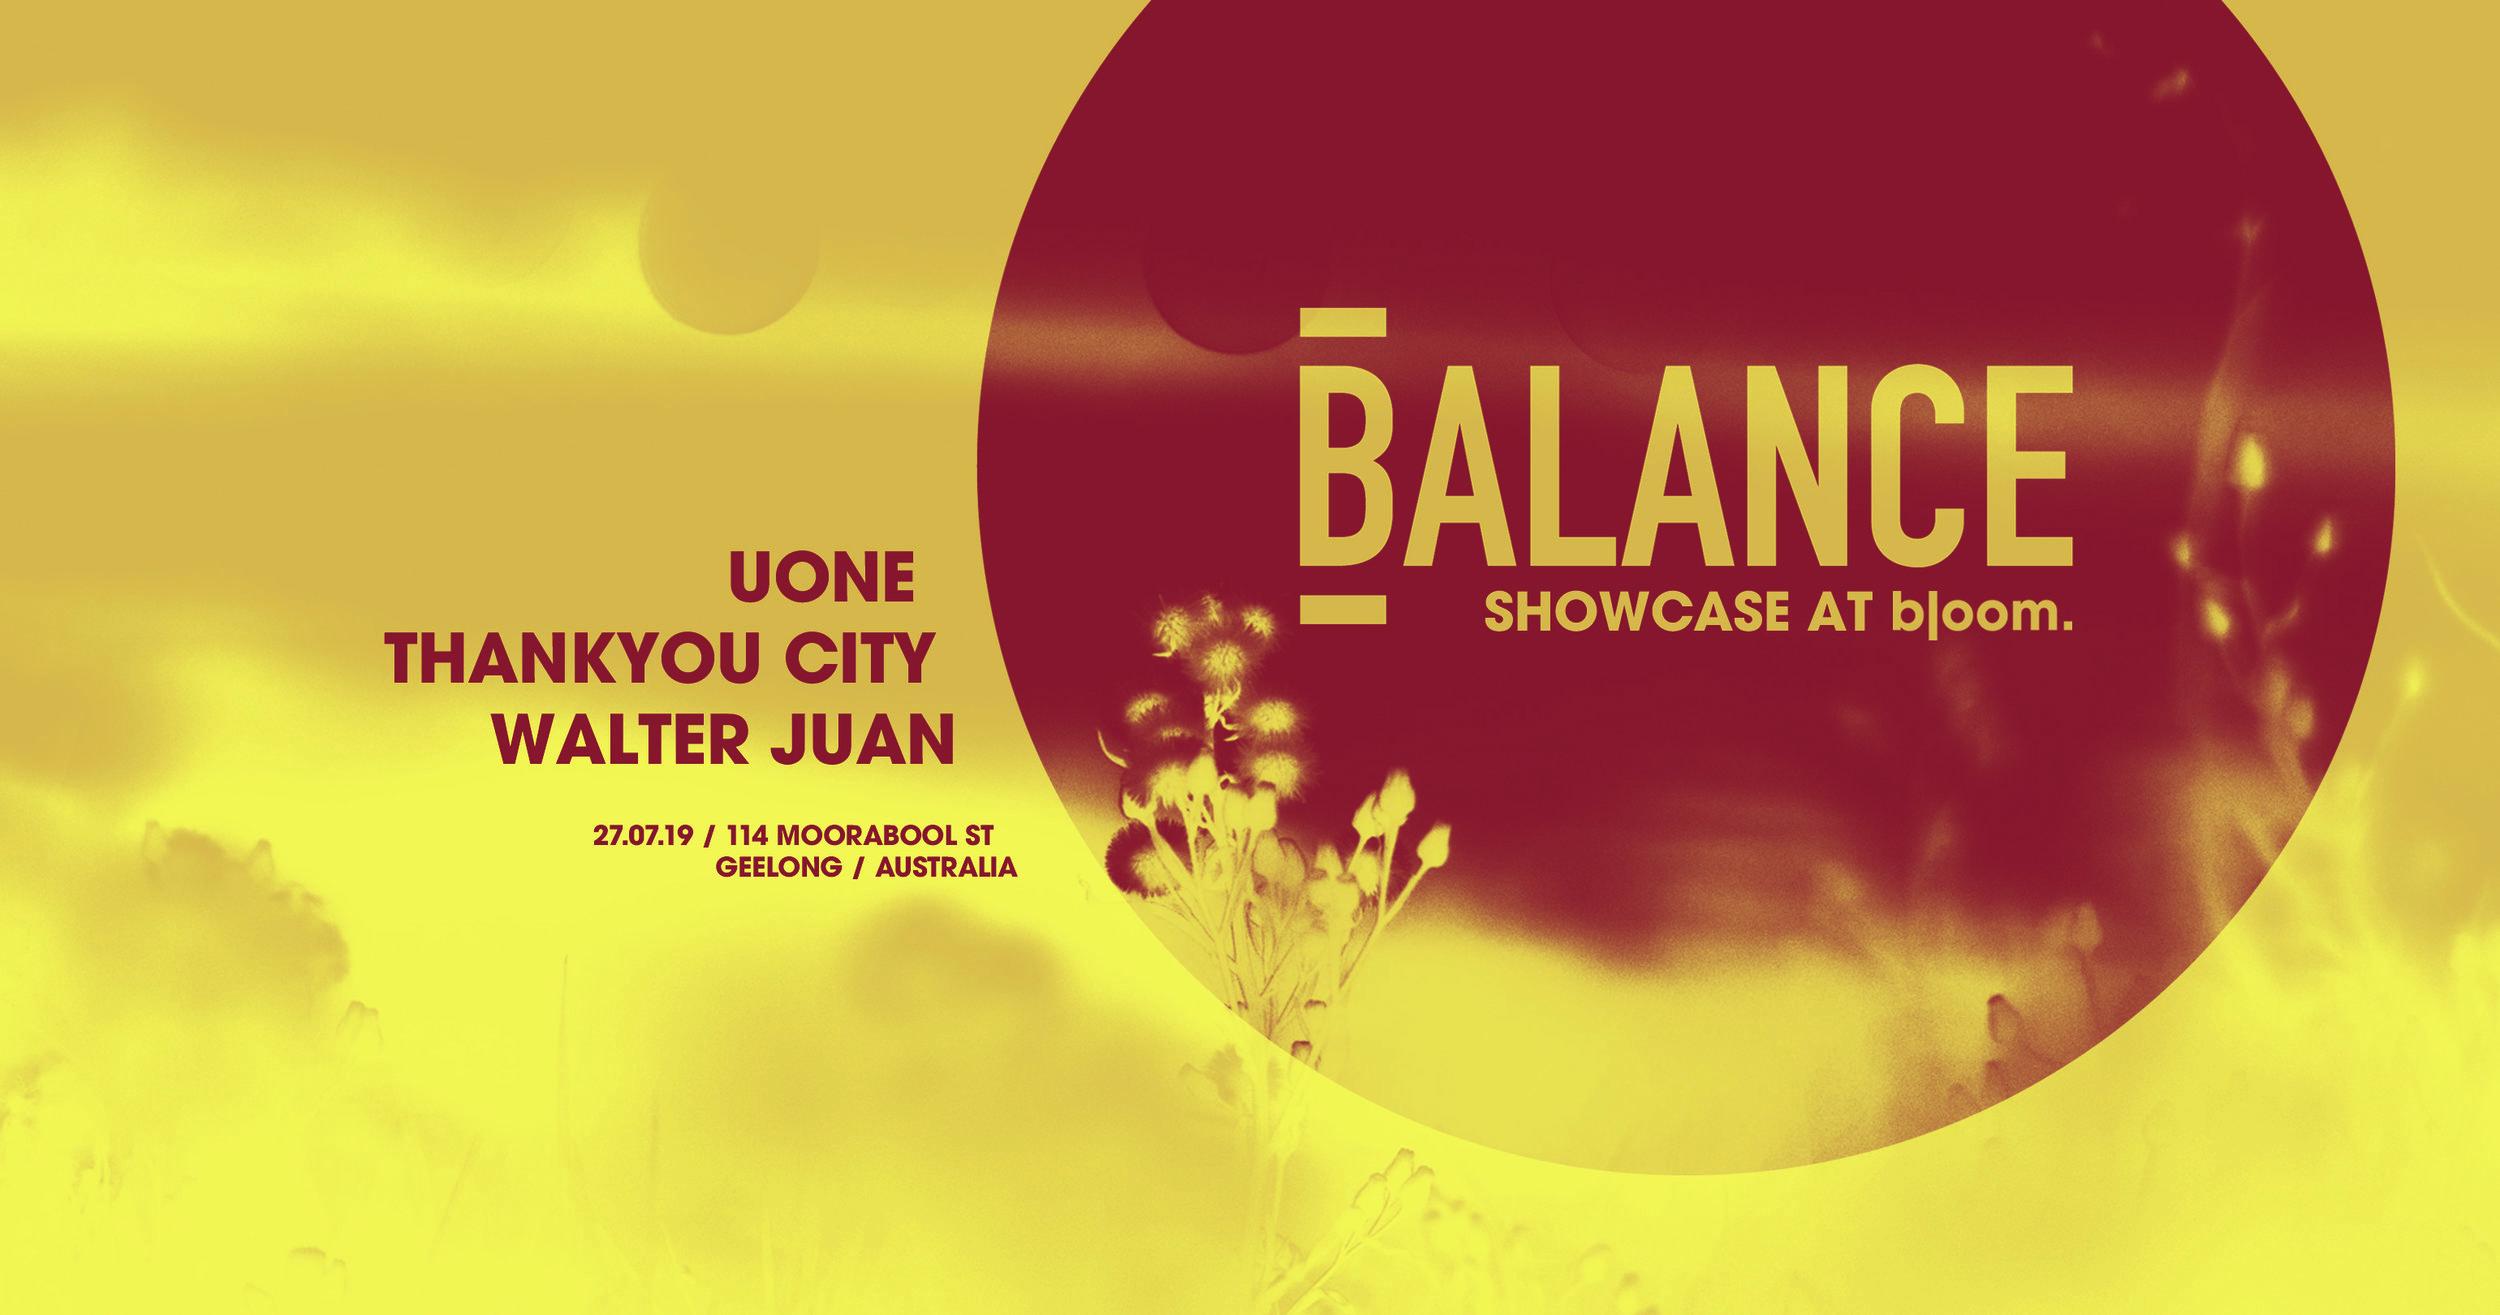 Bloom. - 089 - Balance Showcase - Saturday 27th July, Bloom